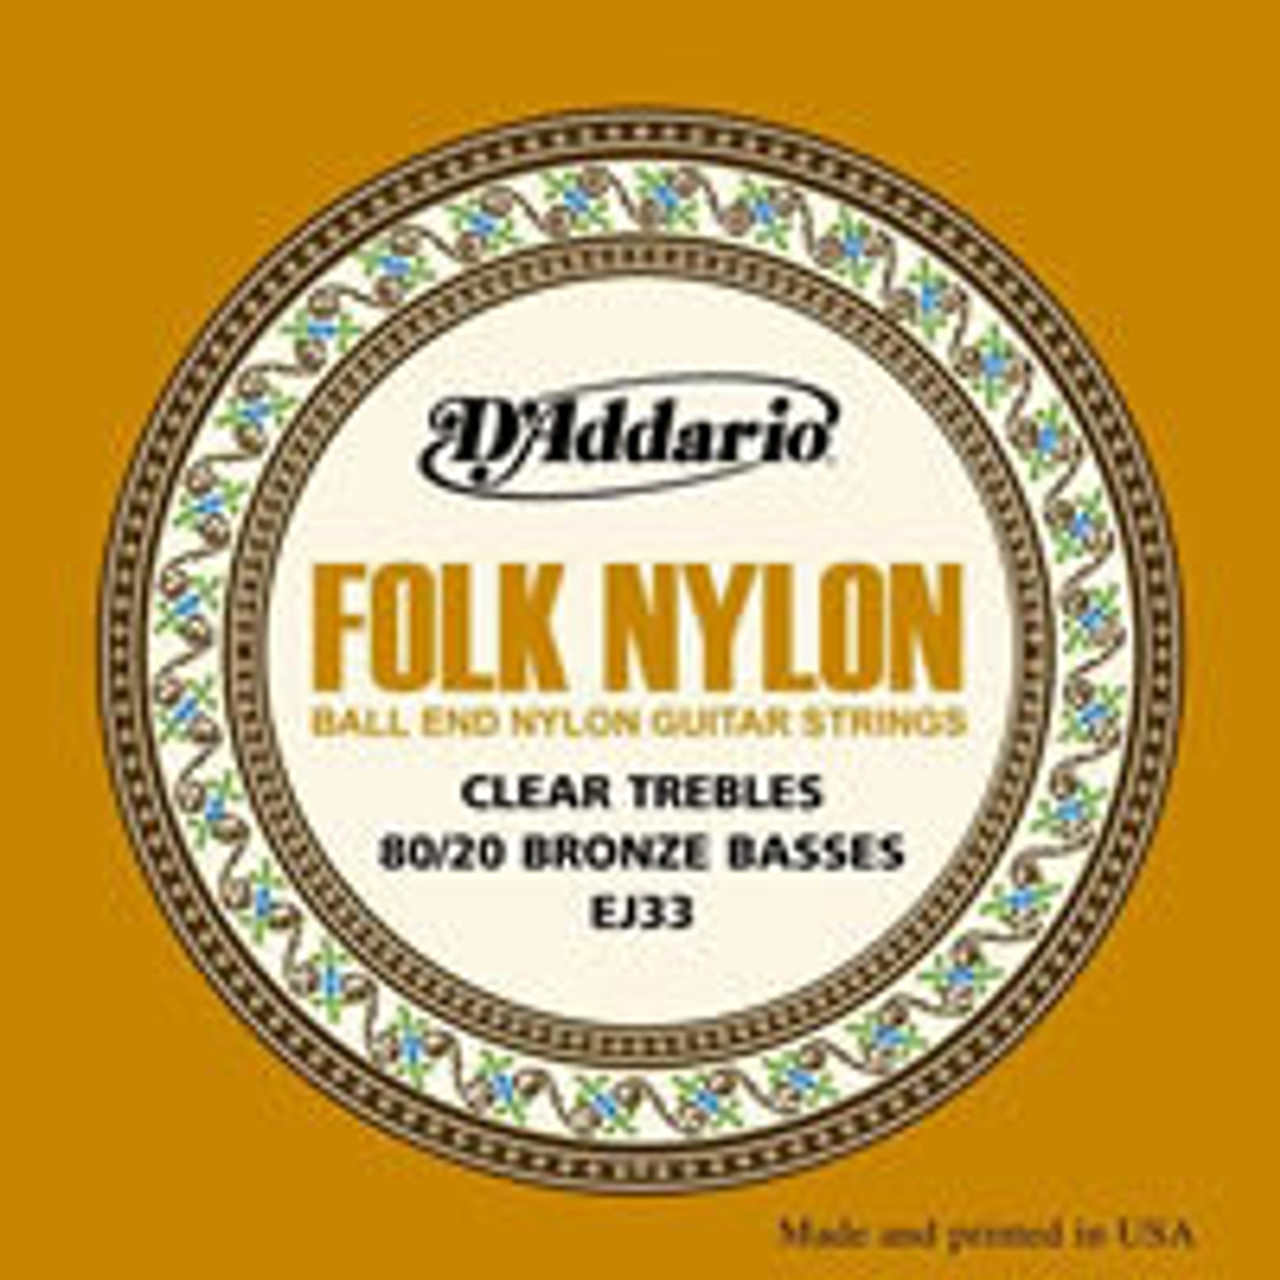 D'addario Folk Nylon Ball End Guitar Strings